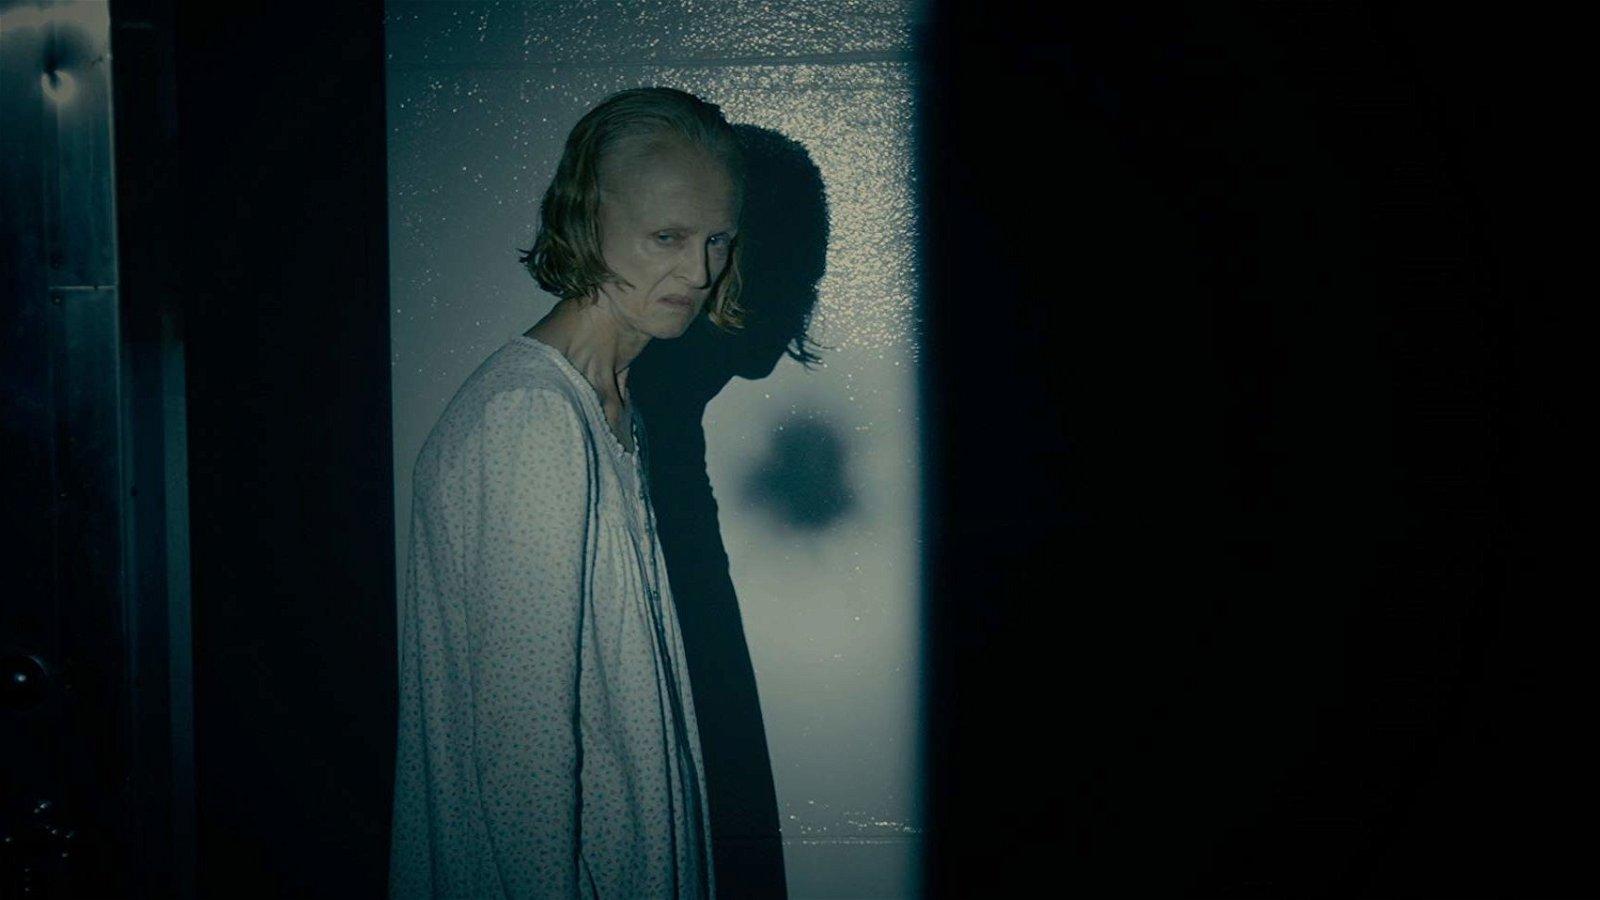 Terror Films To Re-Release The Taking Of Deborah Logan